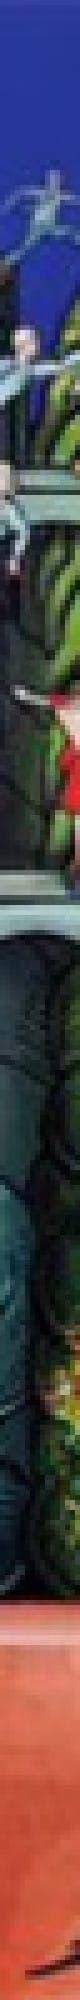 CPS-creier-uzina-minune-550x400_c